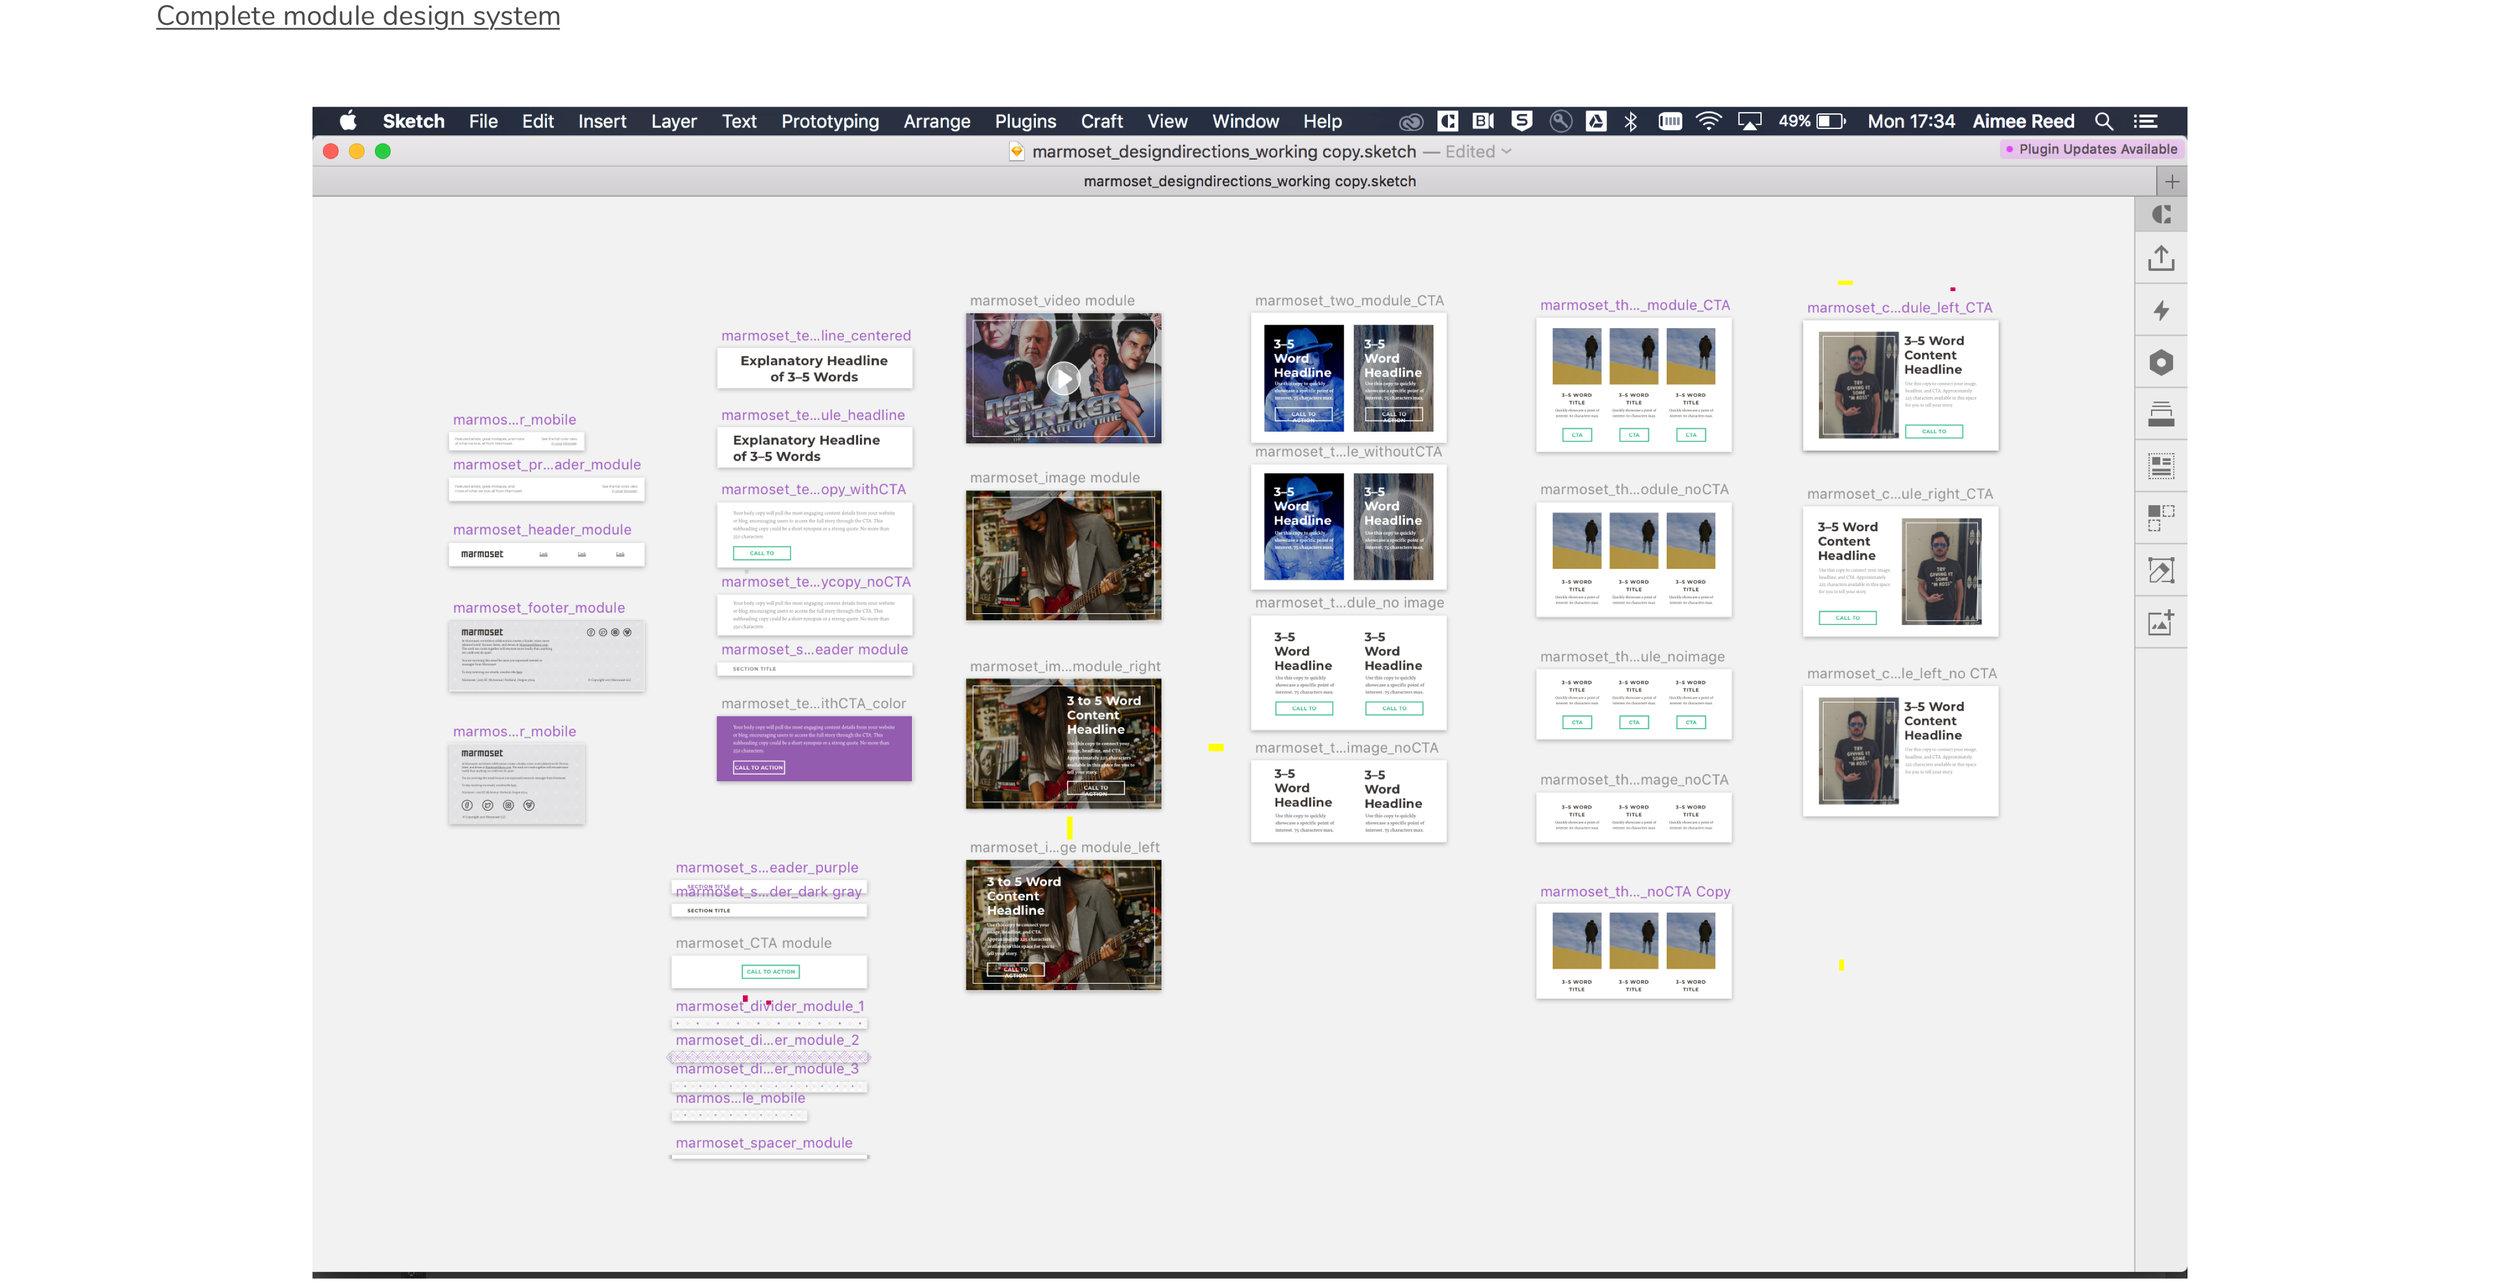 all_modules_design.jpg